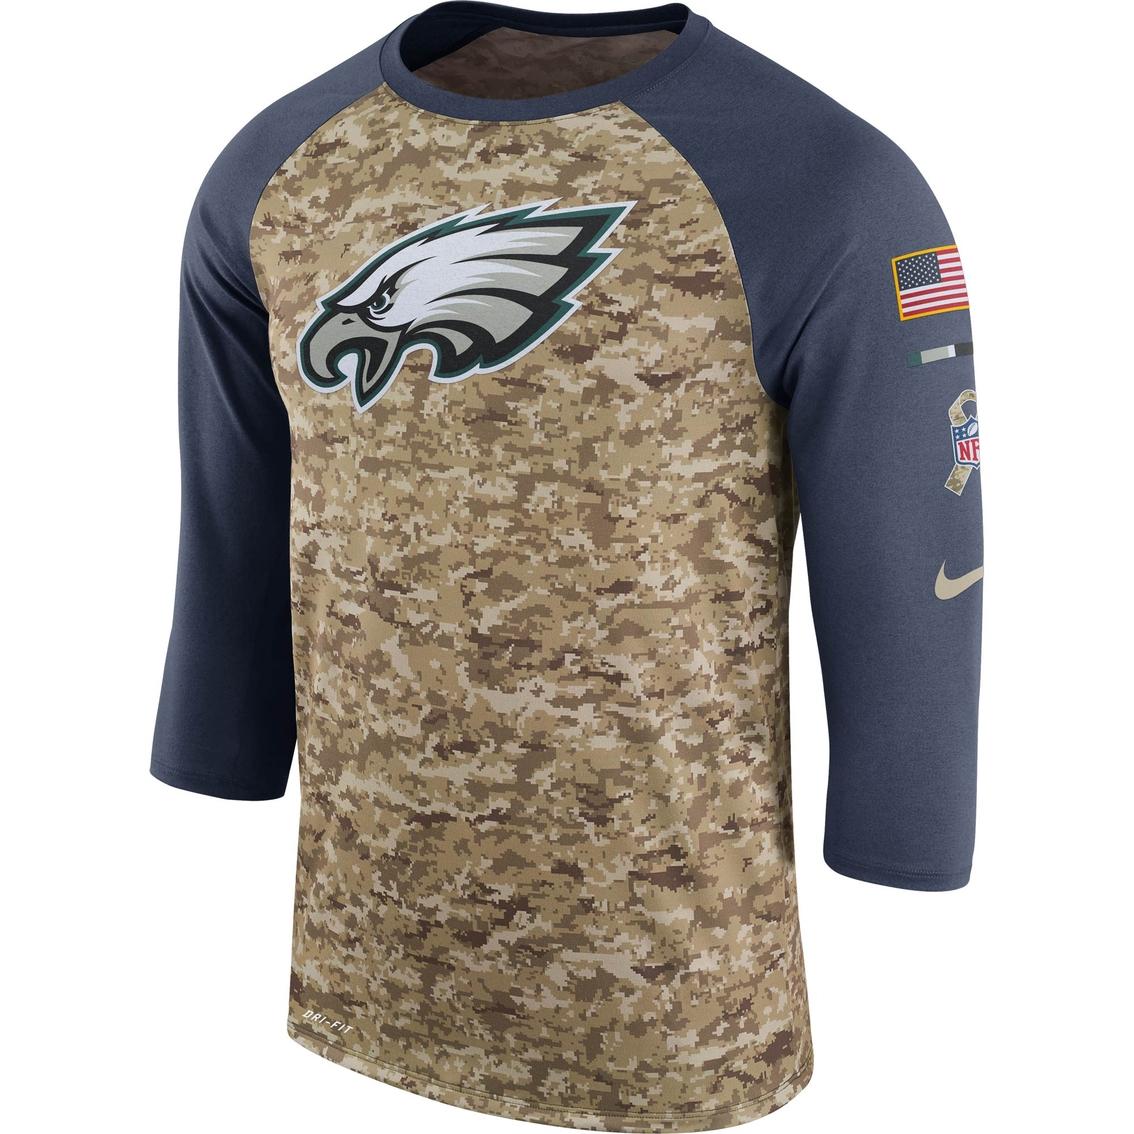 pretty nice 1d229 55fcf Nike Nfl Philadelphia Eagles Salute To Service Raglan Tee ...